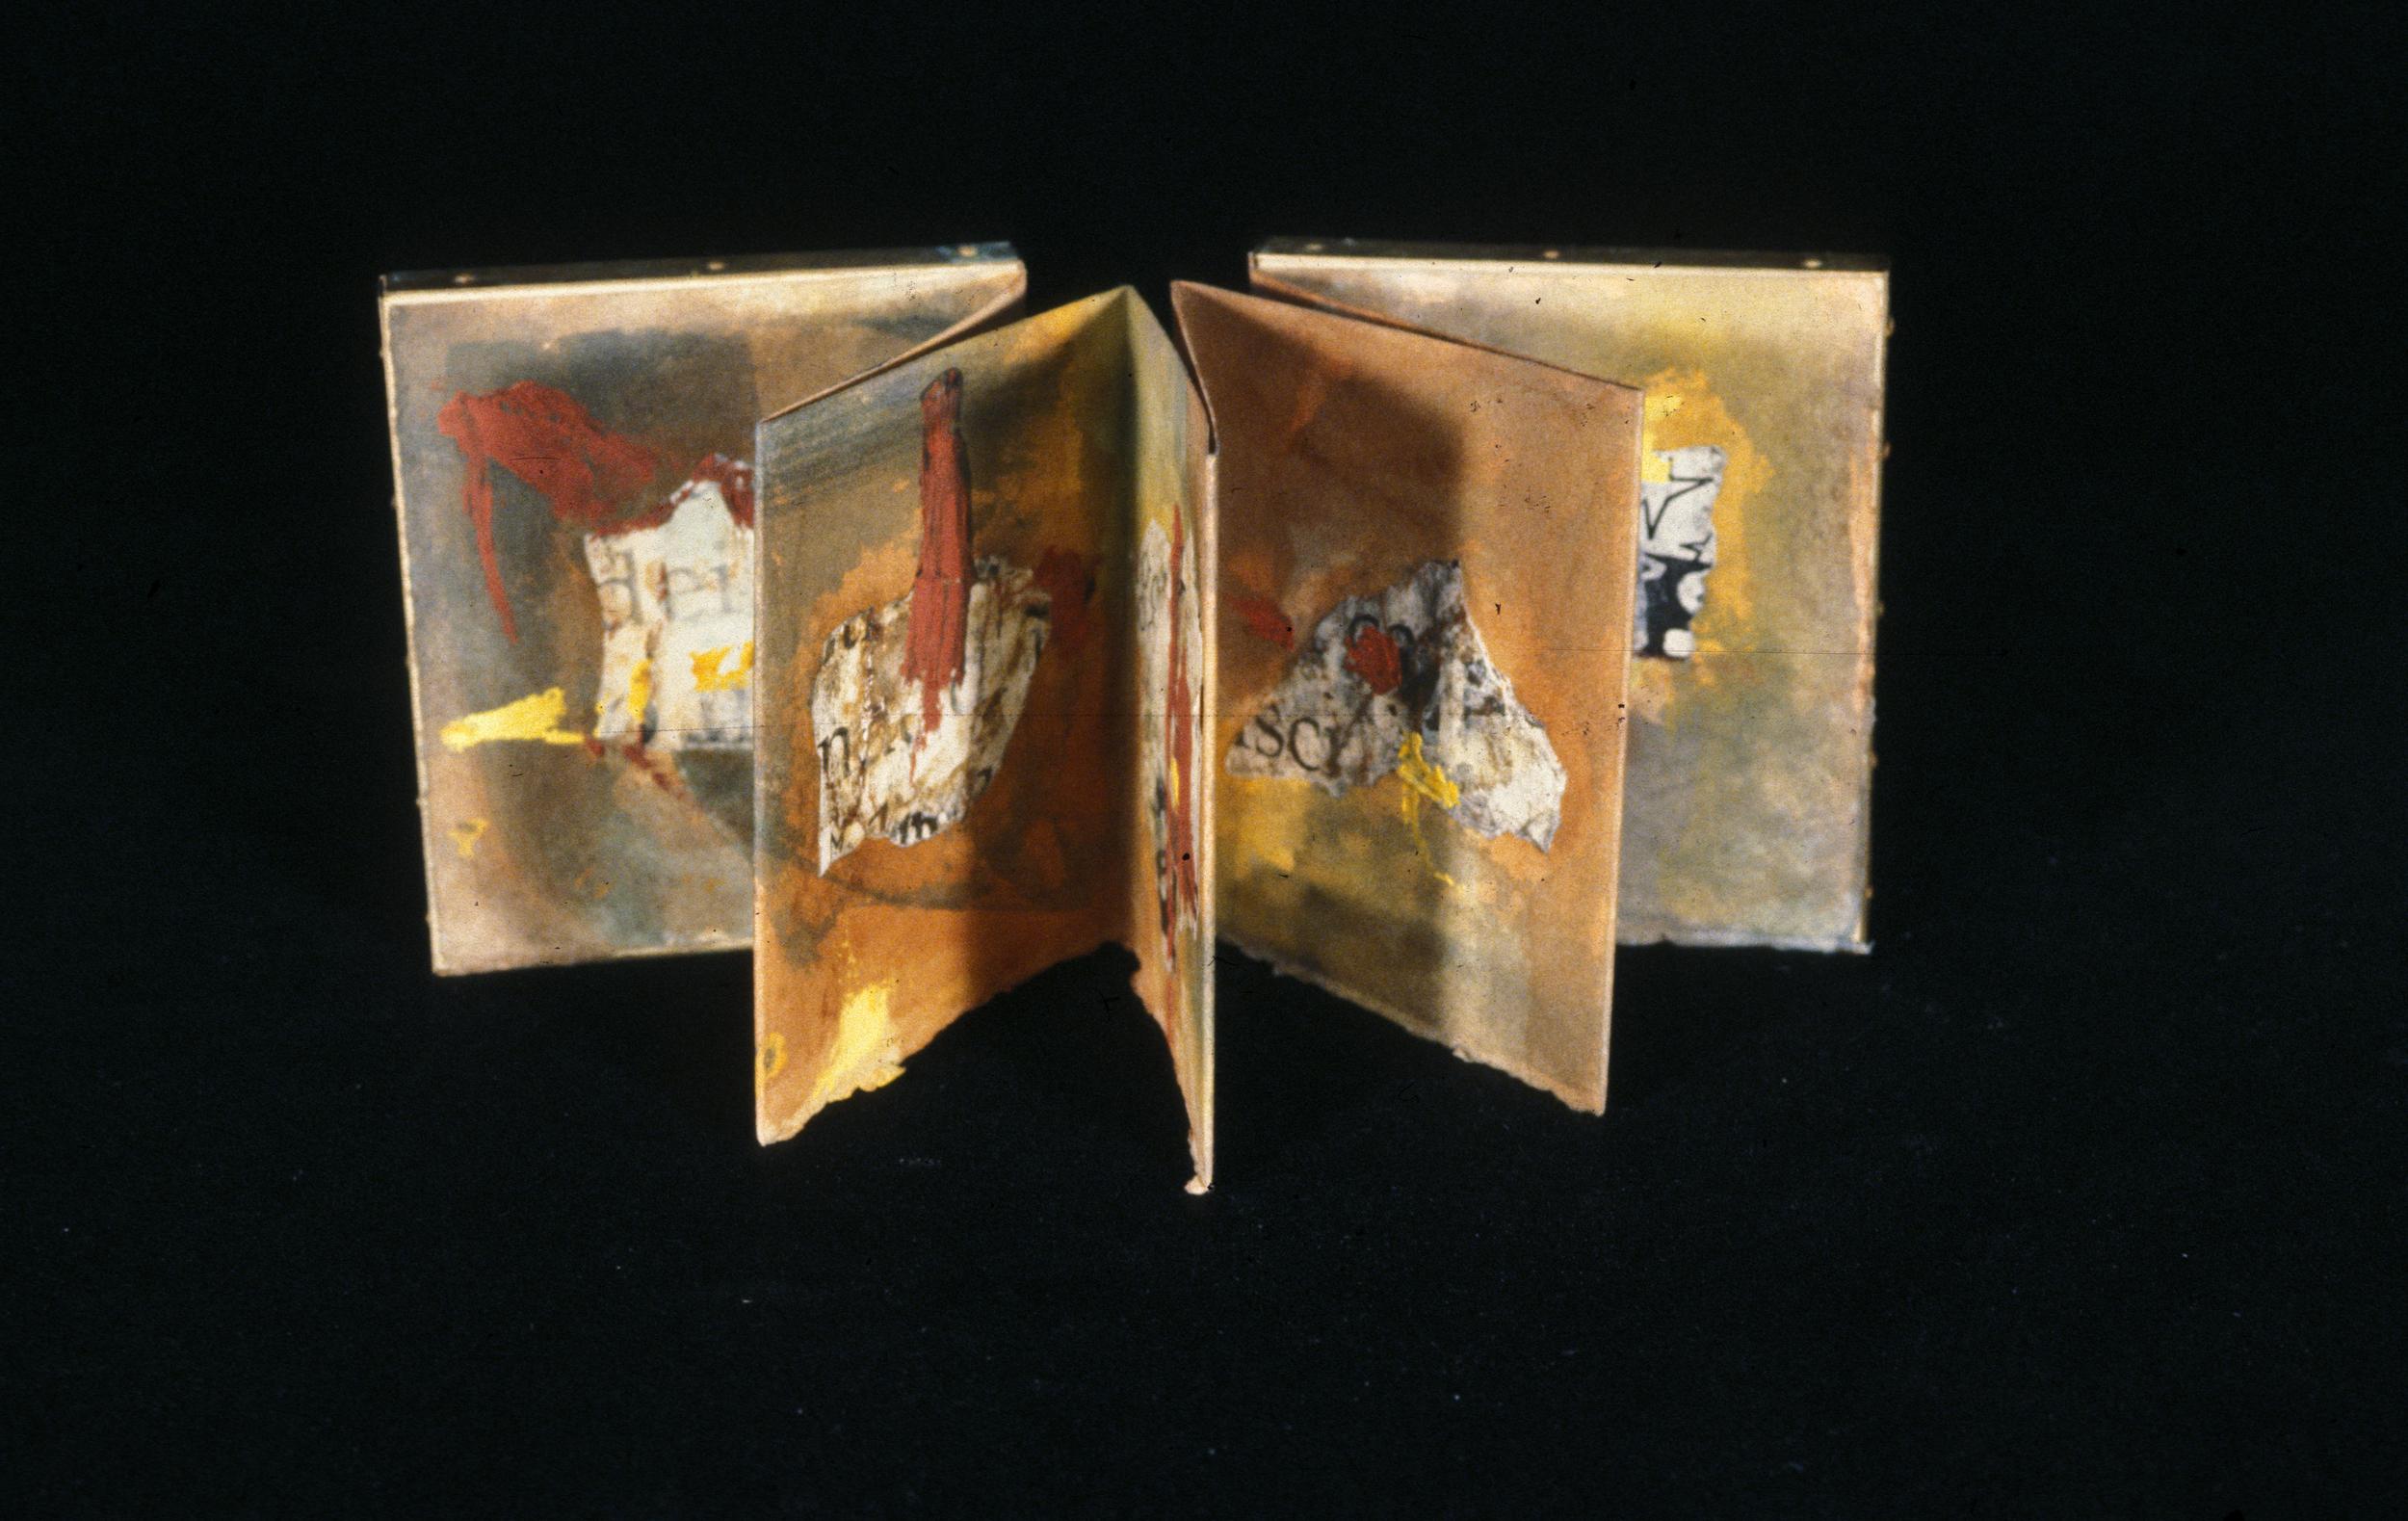 Rome Sketchbooks